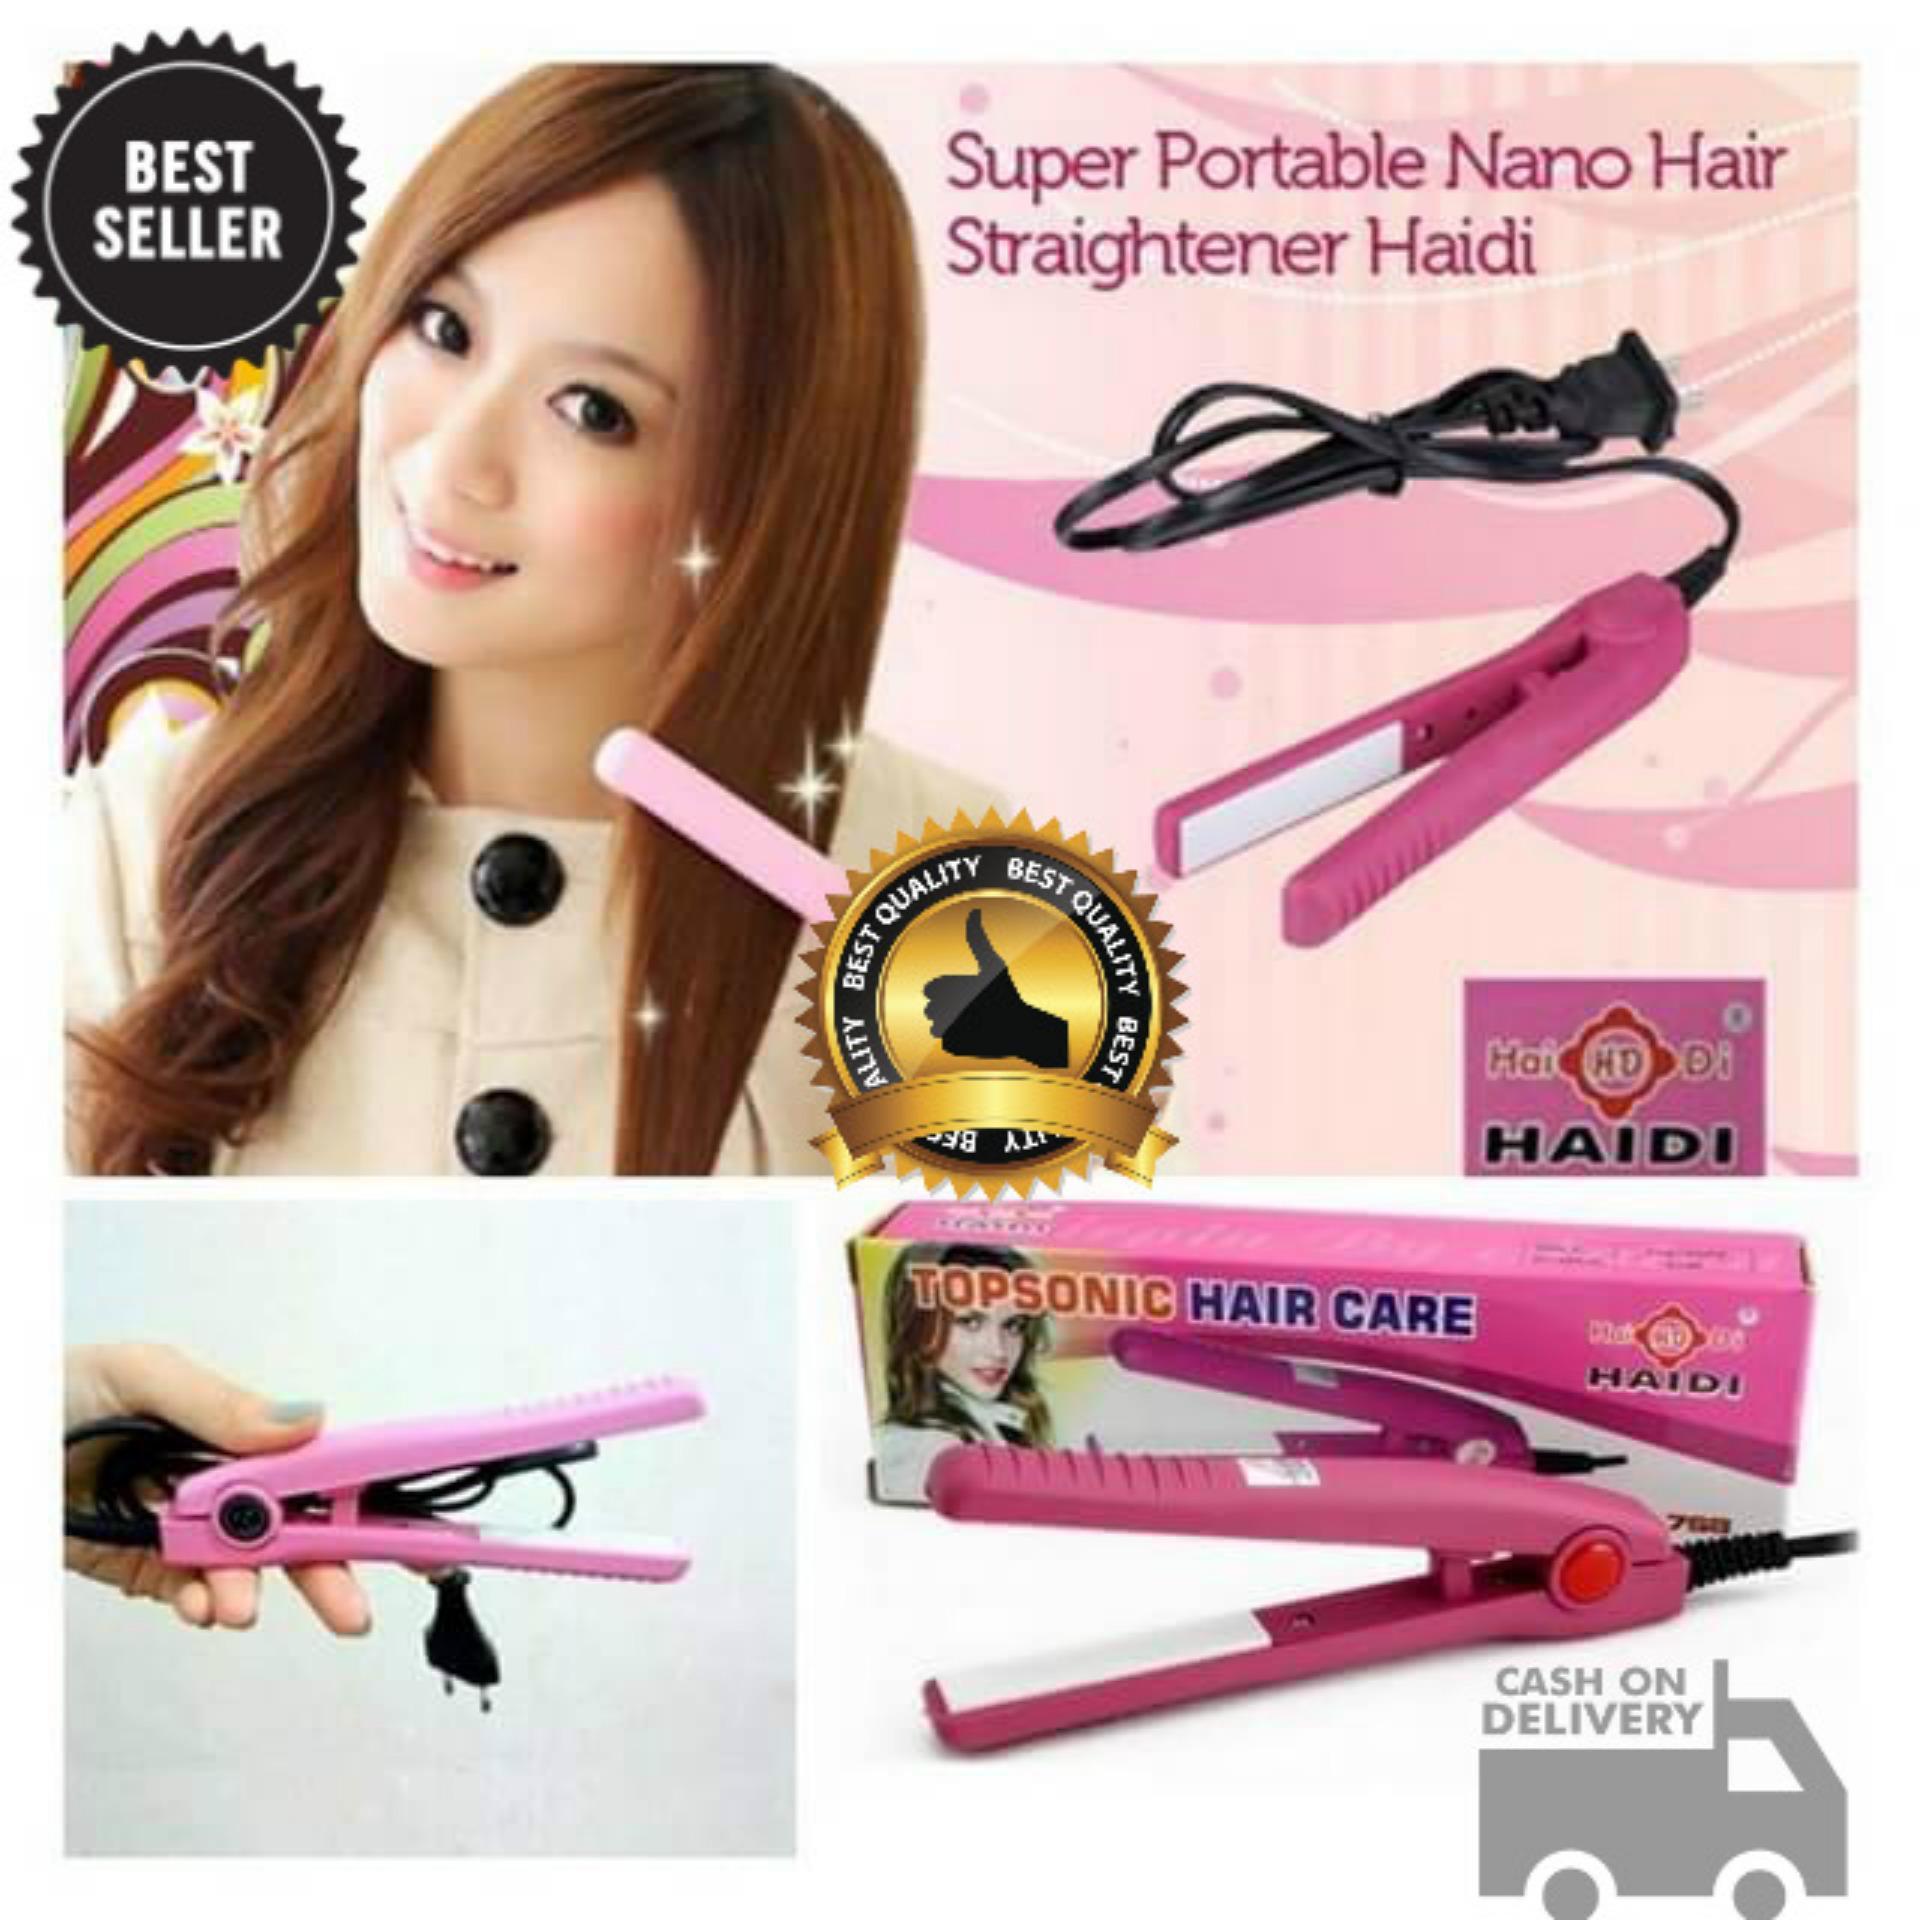 Big King Shop - Catok Pelurus Pengeriting Rambut Asli Mini Curly Hair Wanita Catokan Portable Kecil Praktis Ringan Mudah diaplikasikan Poni Pendek 110-220V